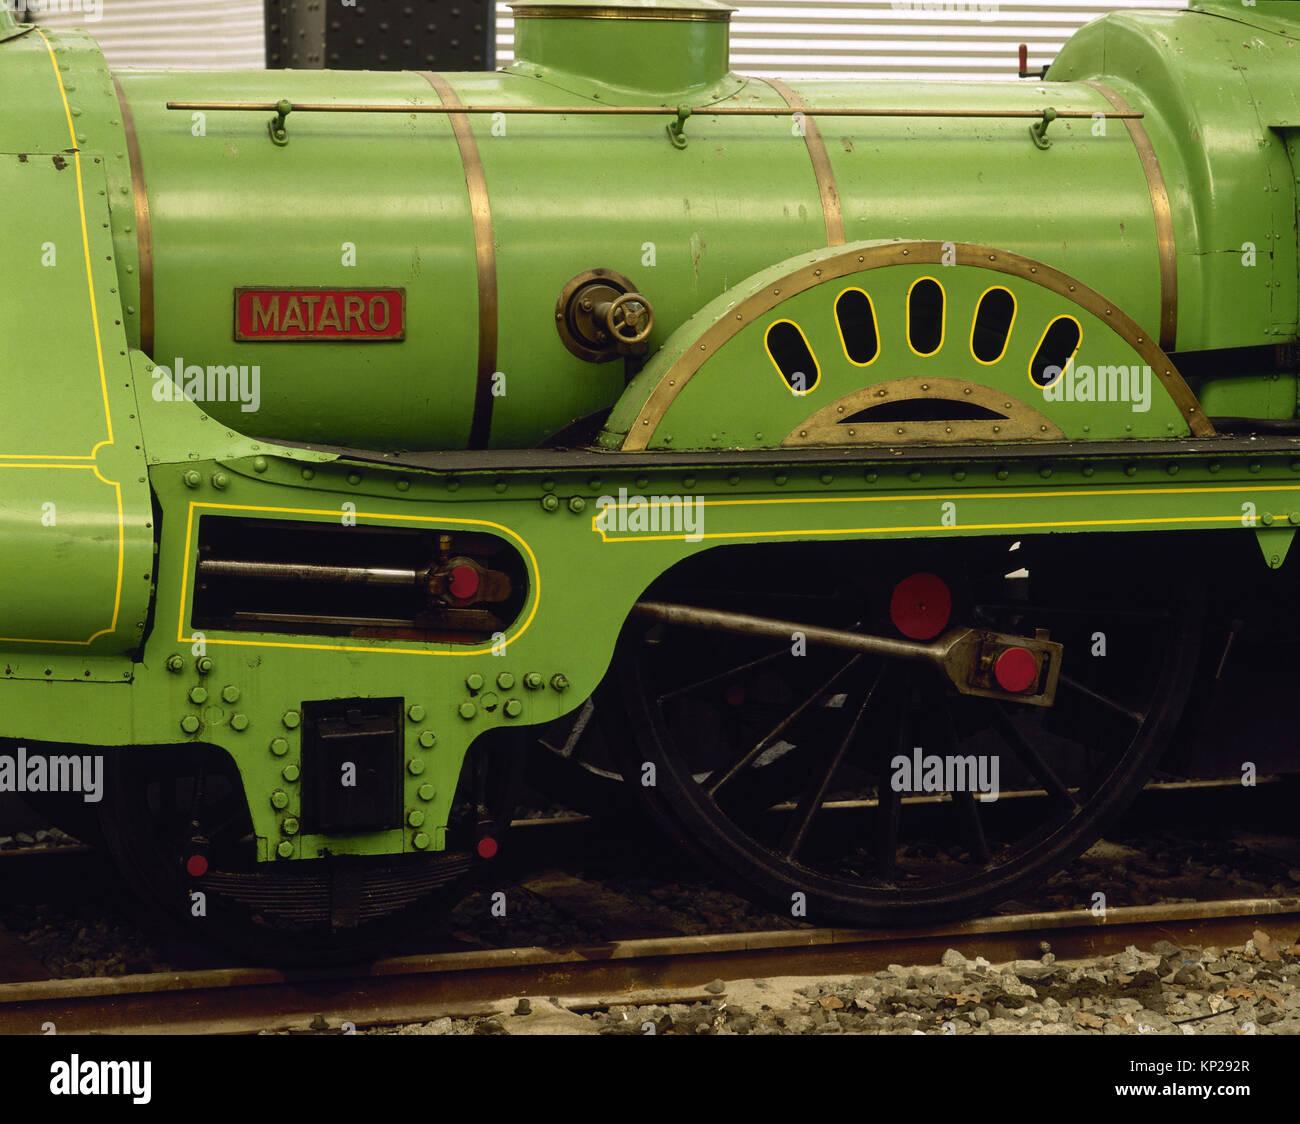 Locomotive Barcelona-Mataro, 1848. Replica. Exposition:150 Years fo railroad history. France Station. Barcelona. - Stock Image